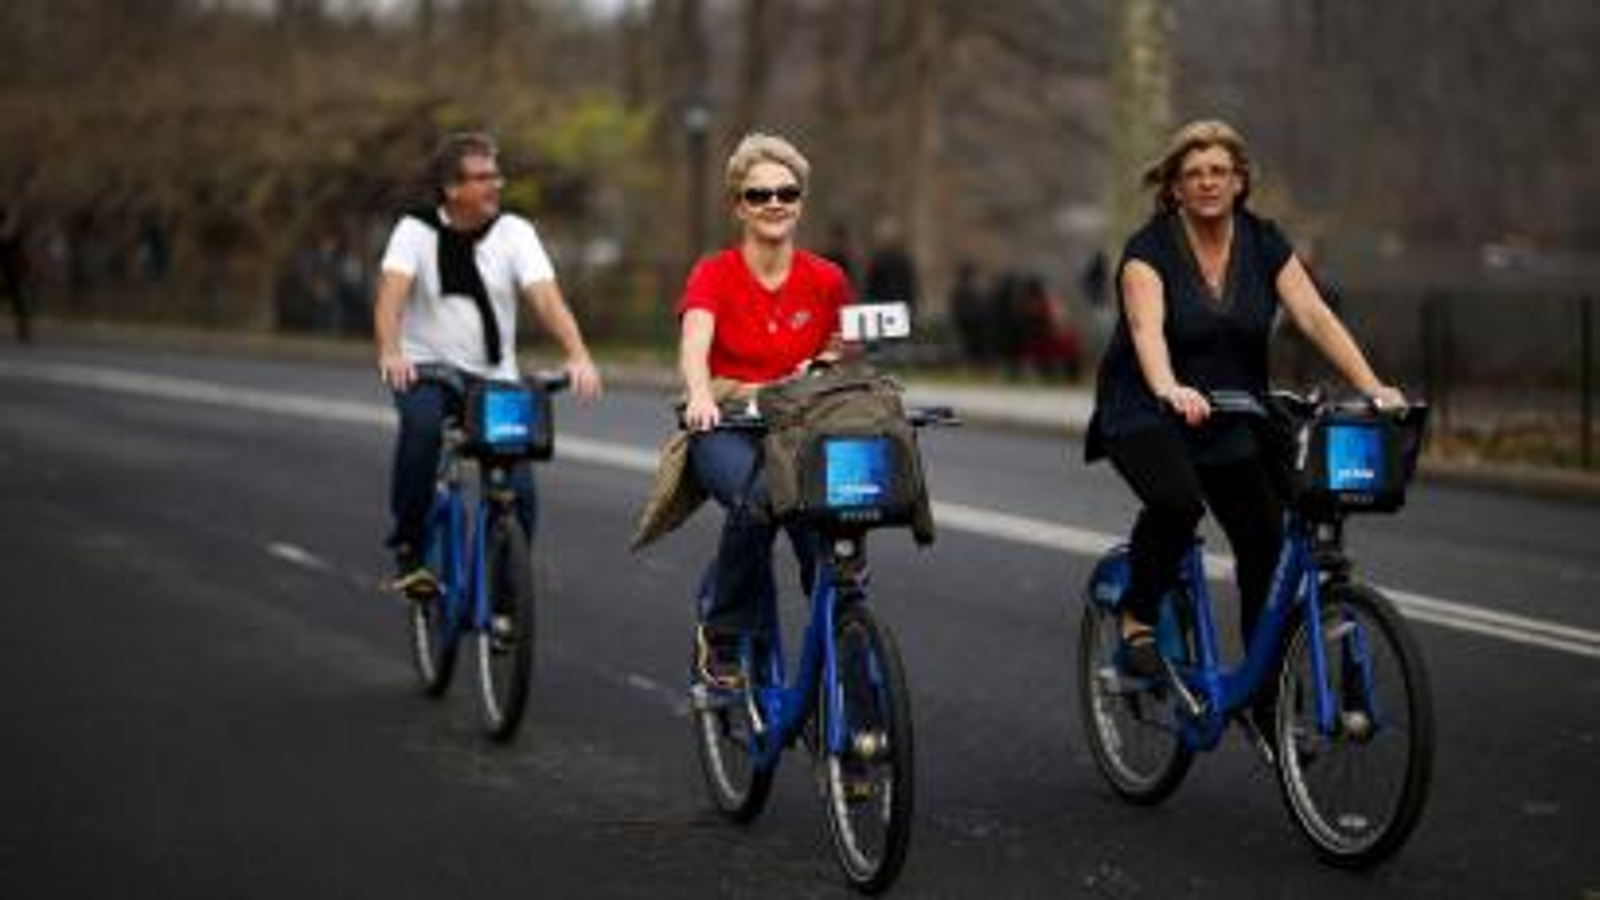 Women enjoy a warm day on their bikes in Central Park